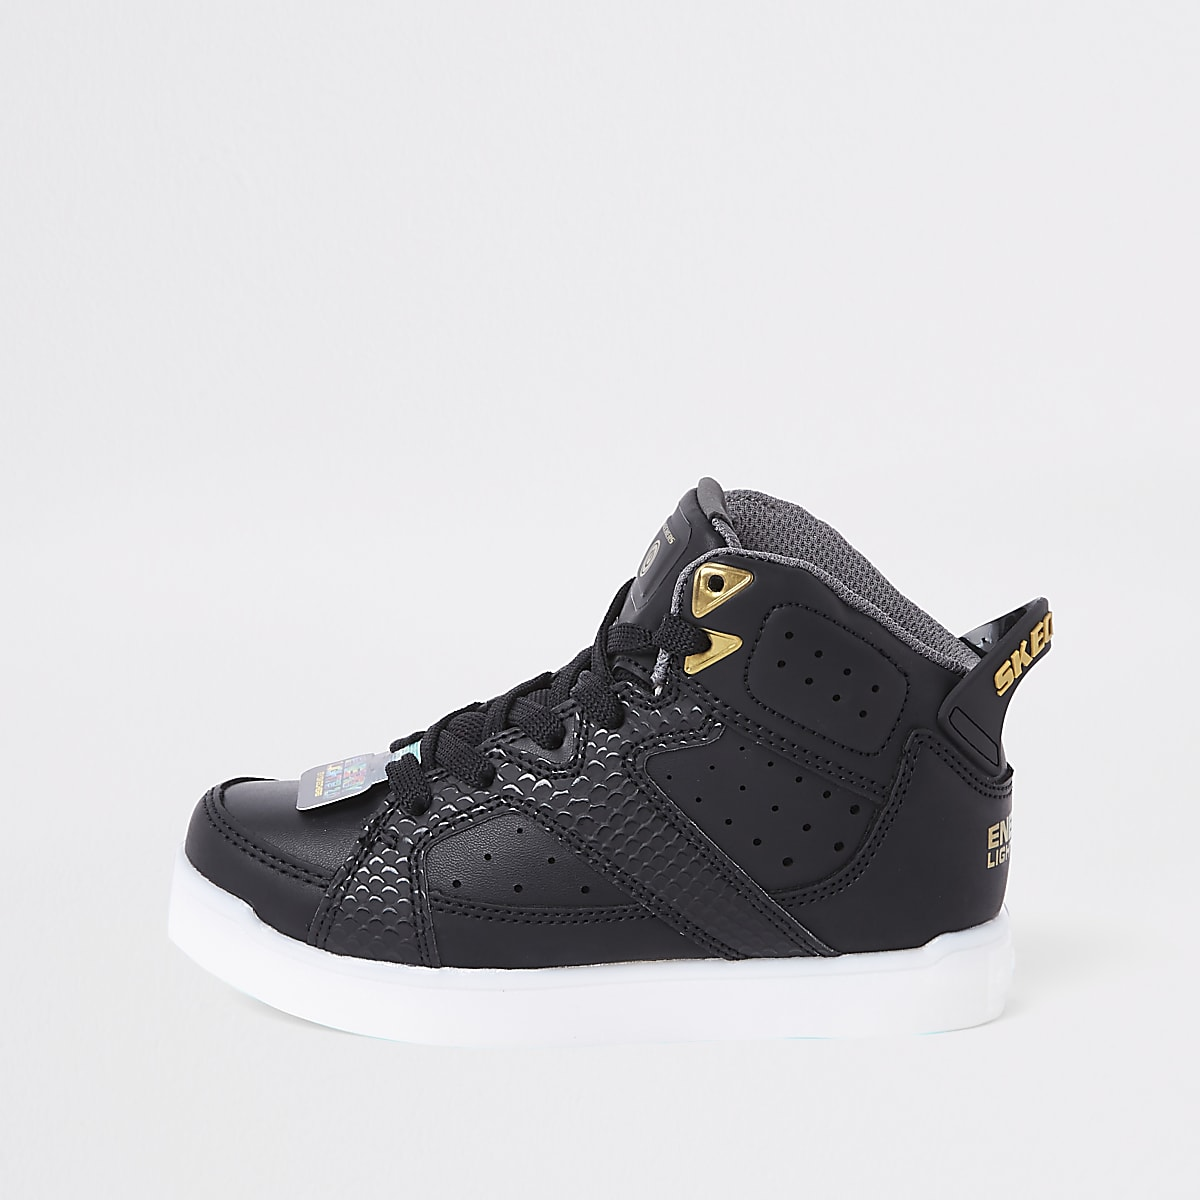 Skechers – Baskets noires clignotantes